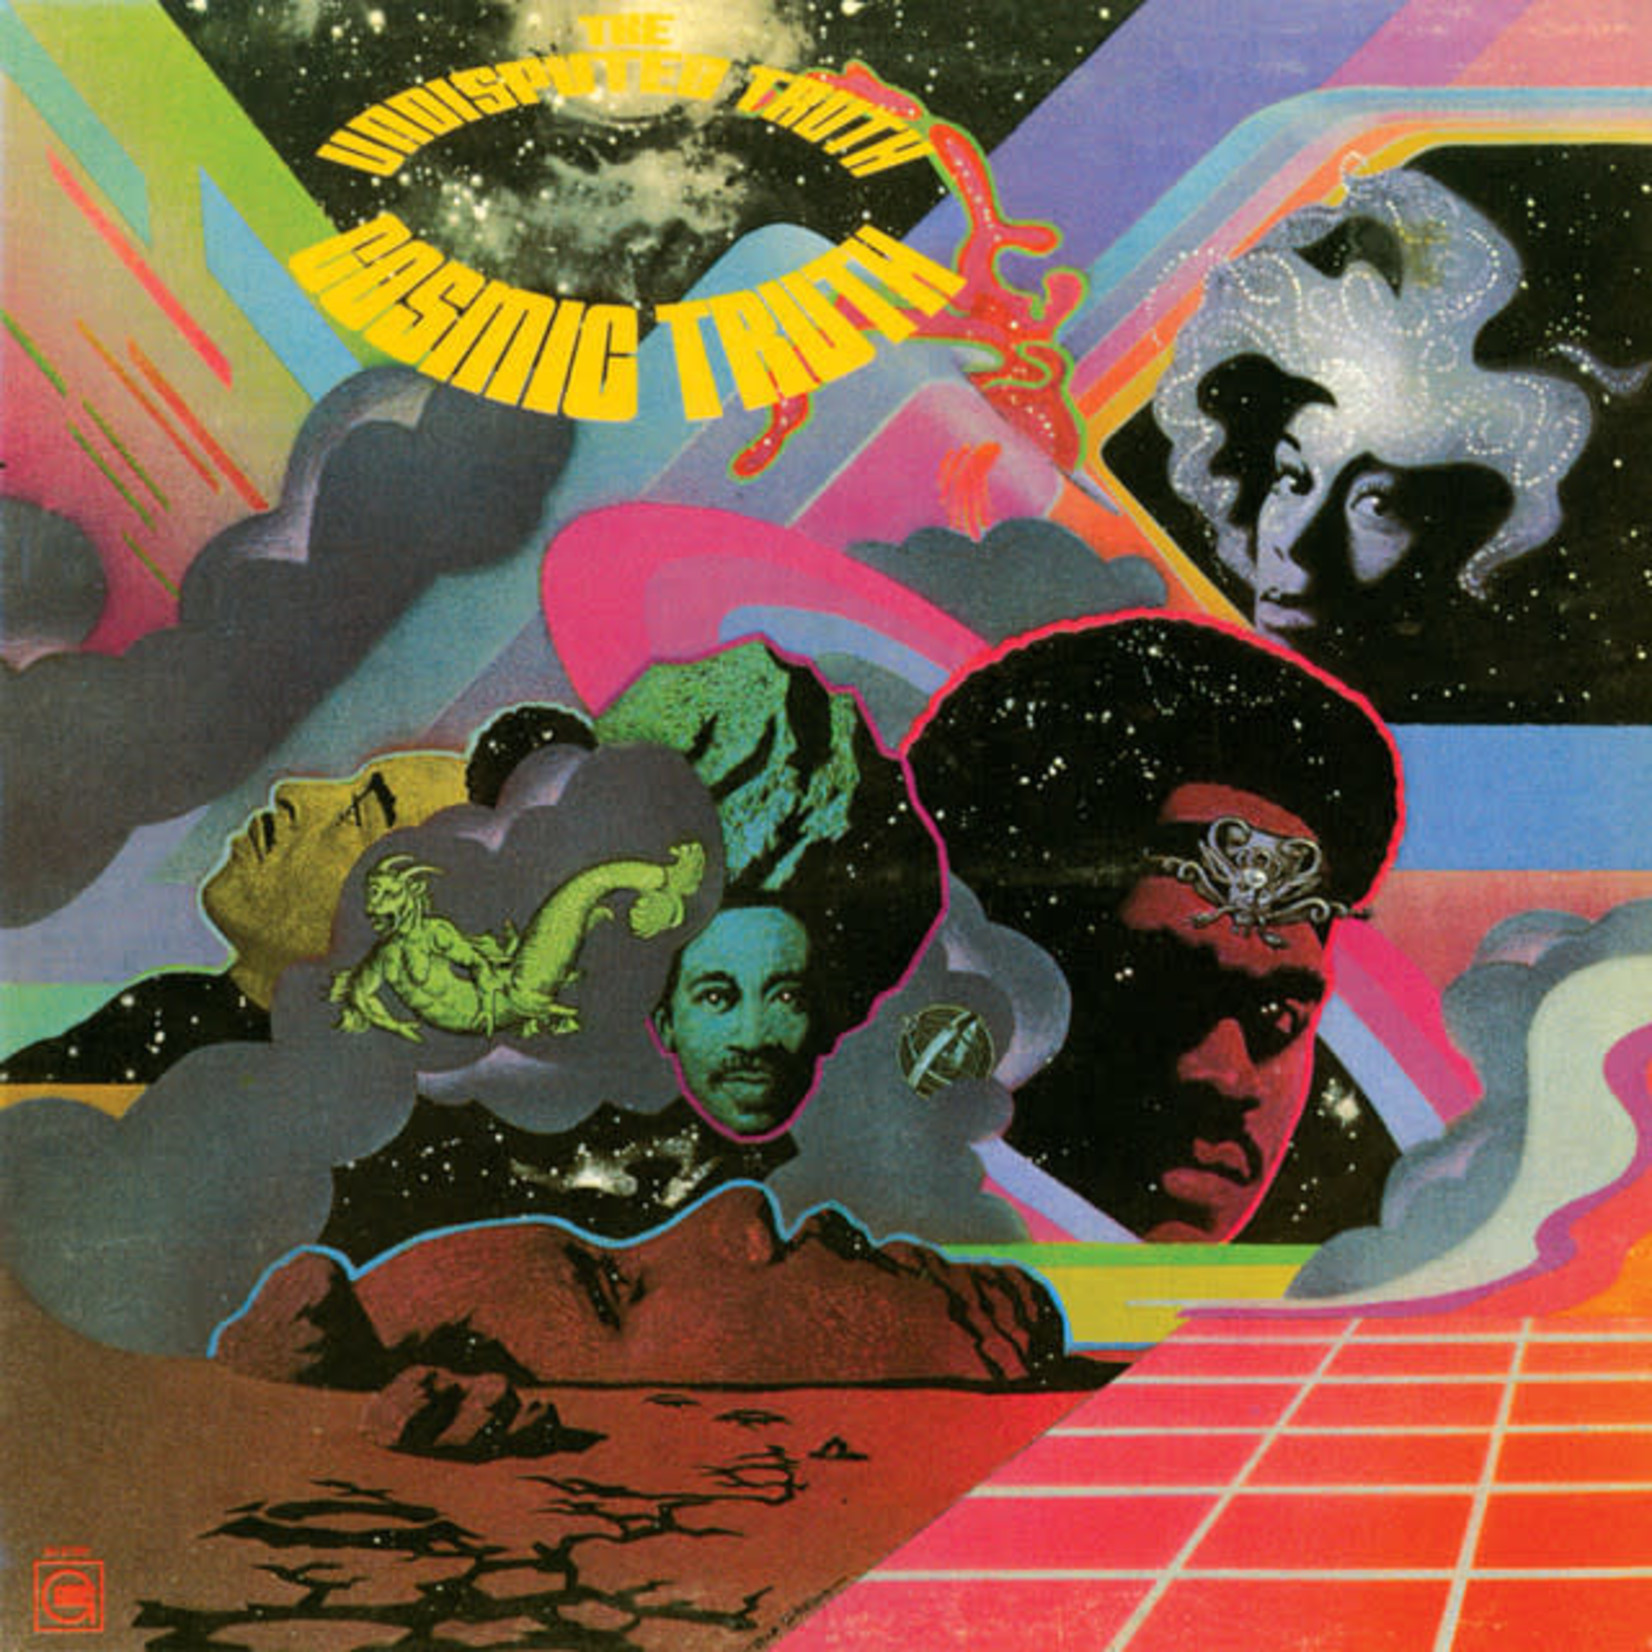 Vinyl The Undisputed Truth - Cosmic Truth